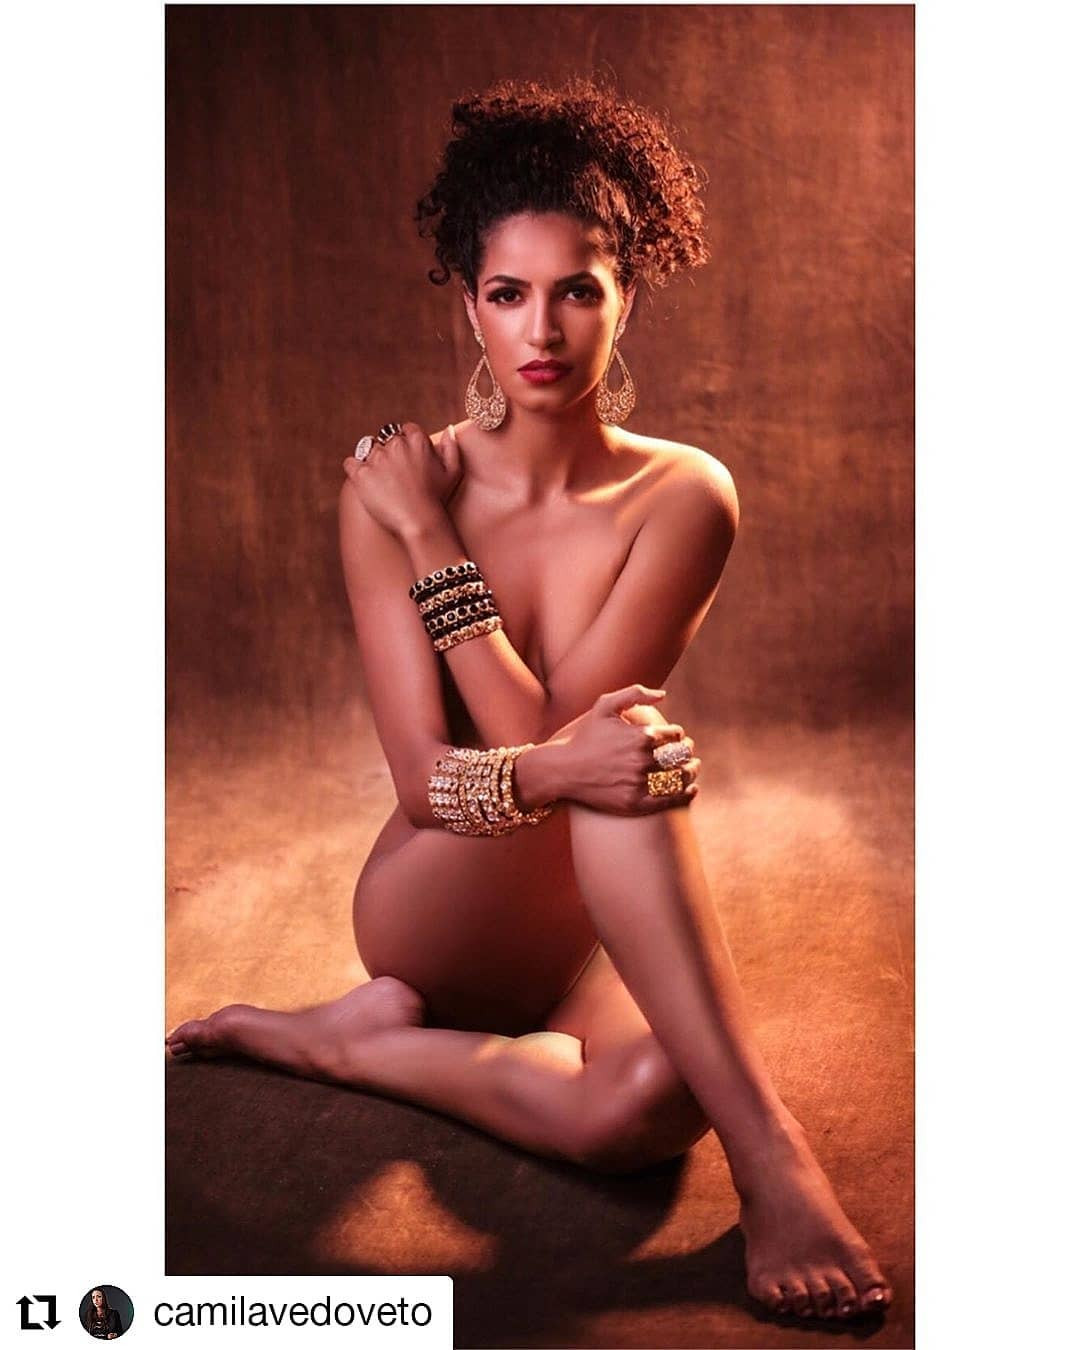 geicyelly mendes, top 20 de miss brasil mundo 2019. - Página 2 Fycrmb10